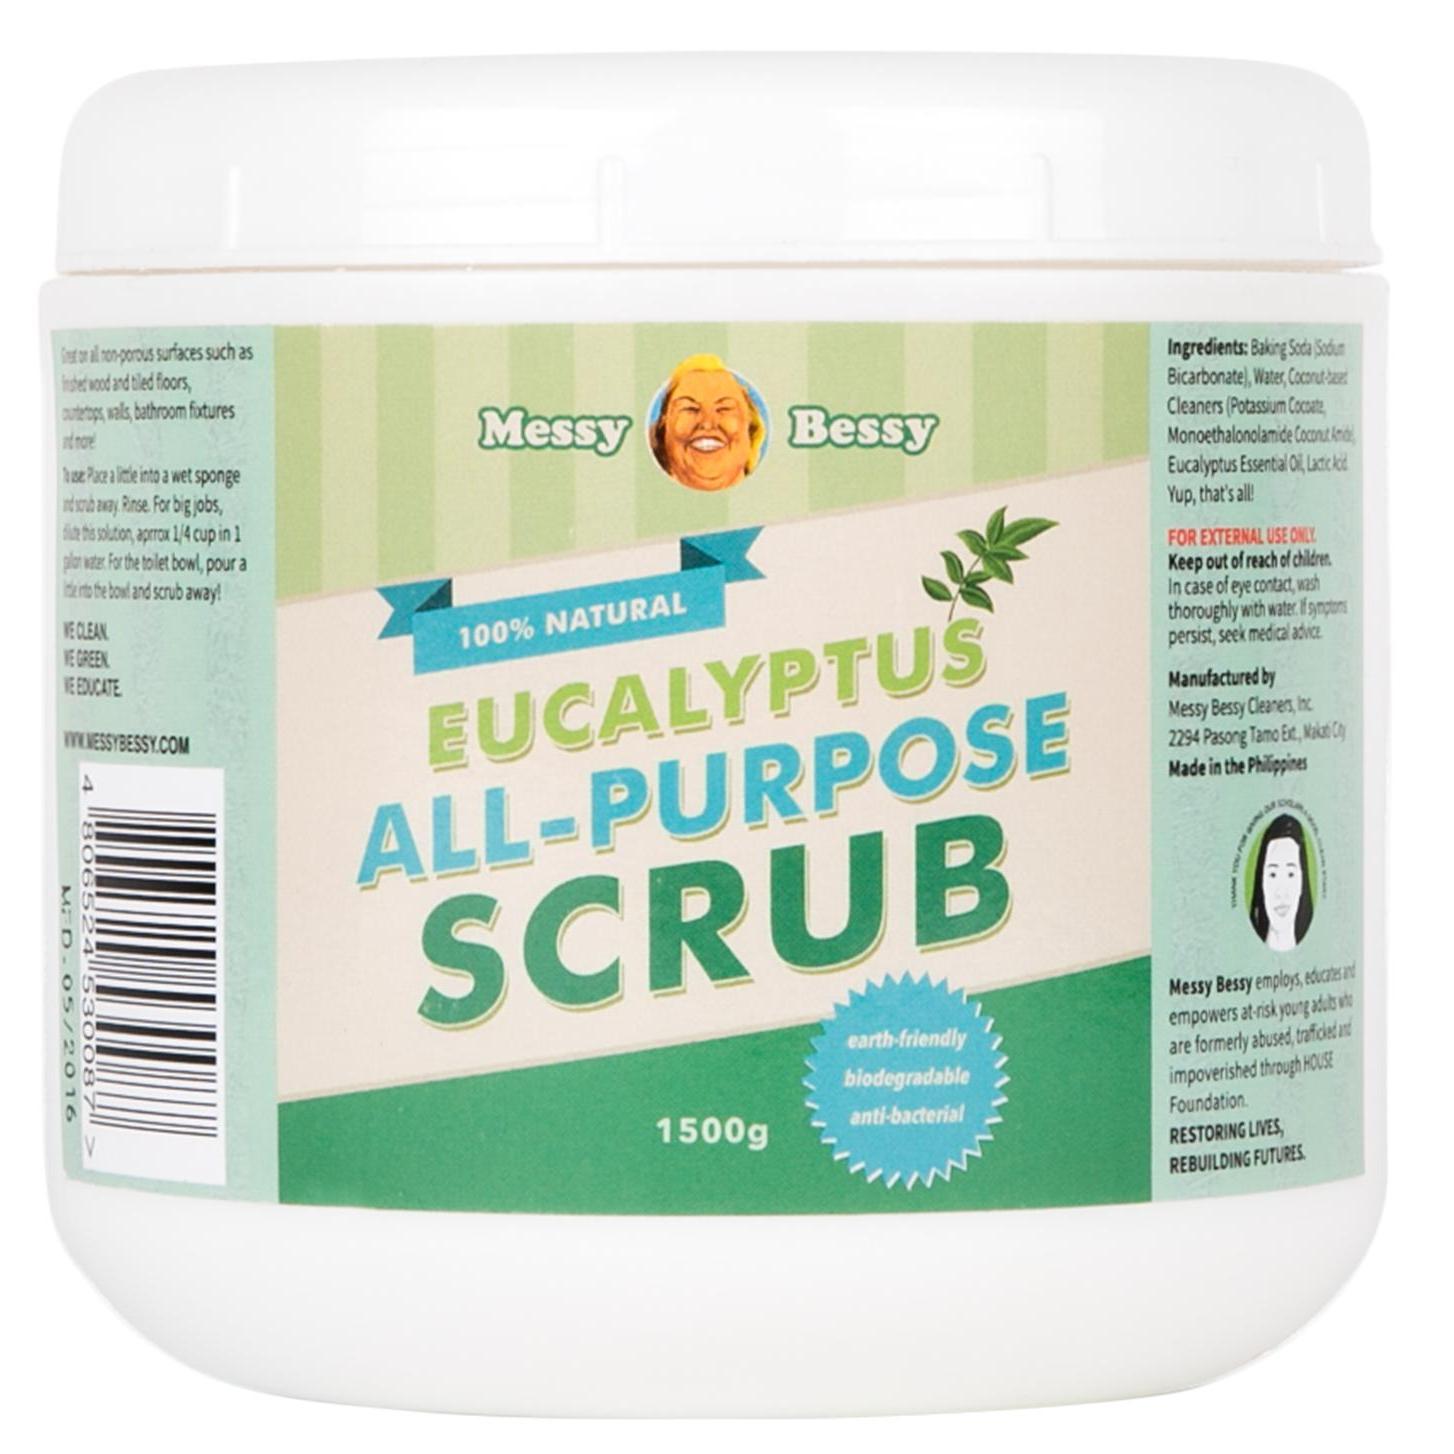 Messy Bessy Eucalyptus All Purpose Scrub 1500g